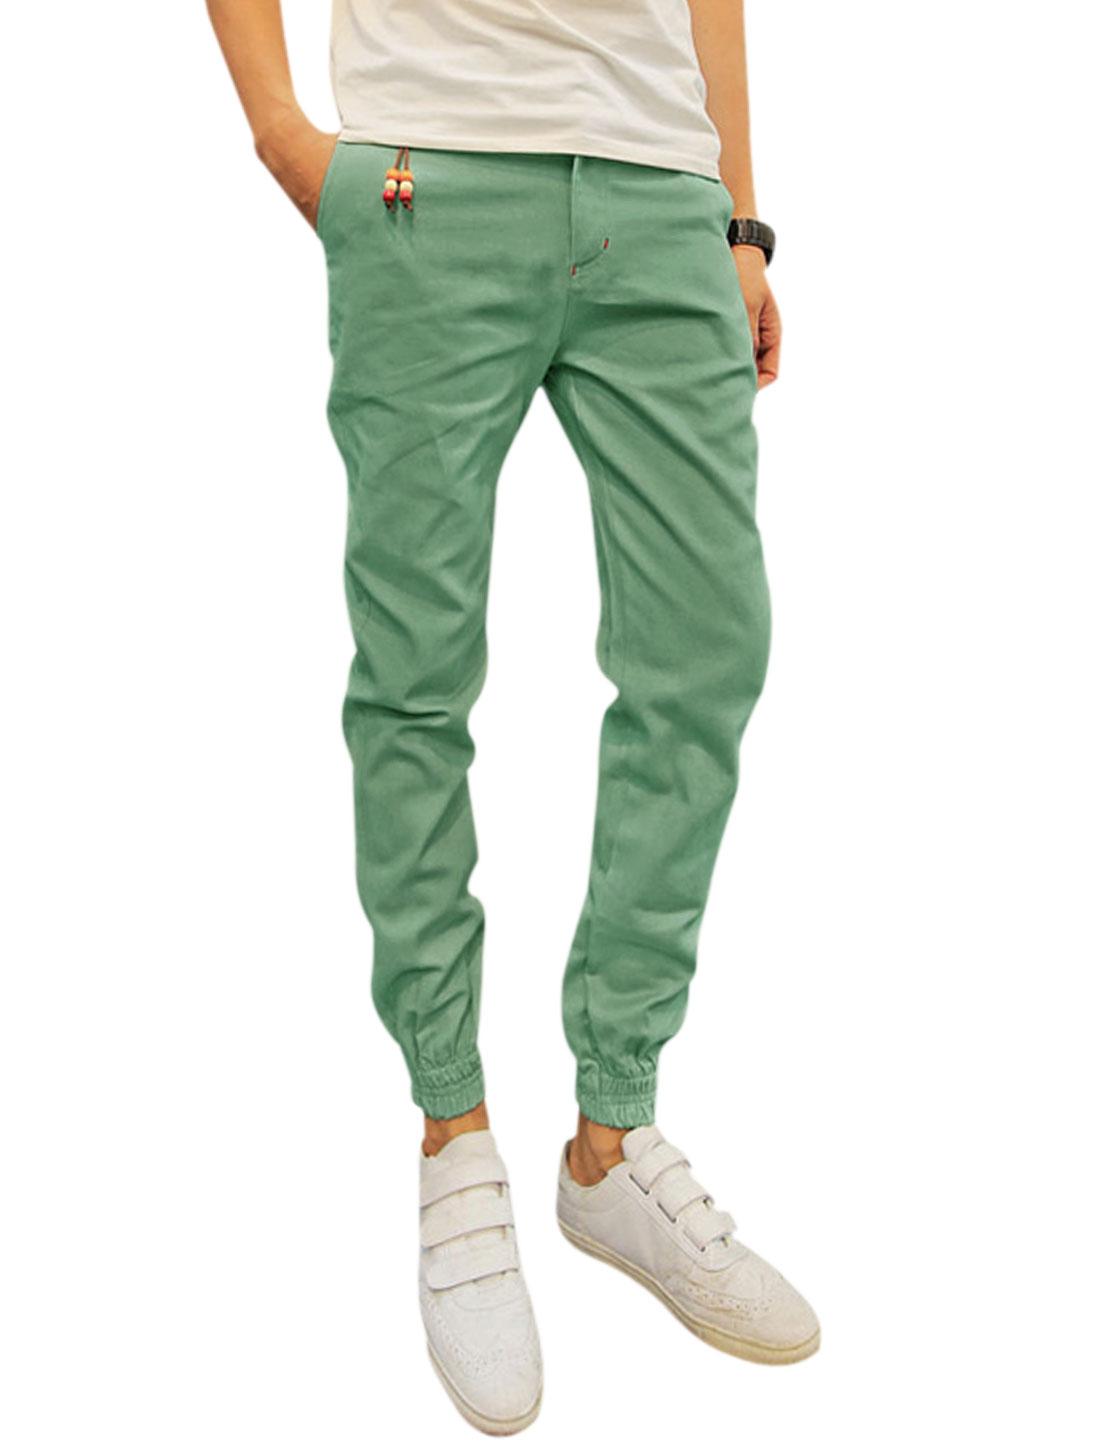 Men Belt Loop Pockets Elastic Cuffs Leisure Pants Mint W30